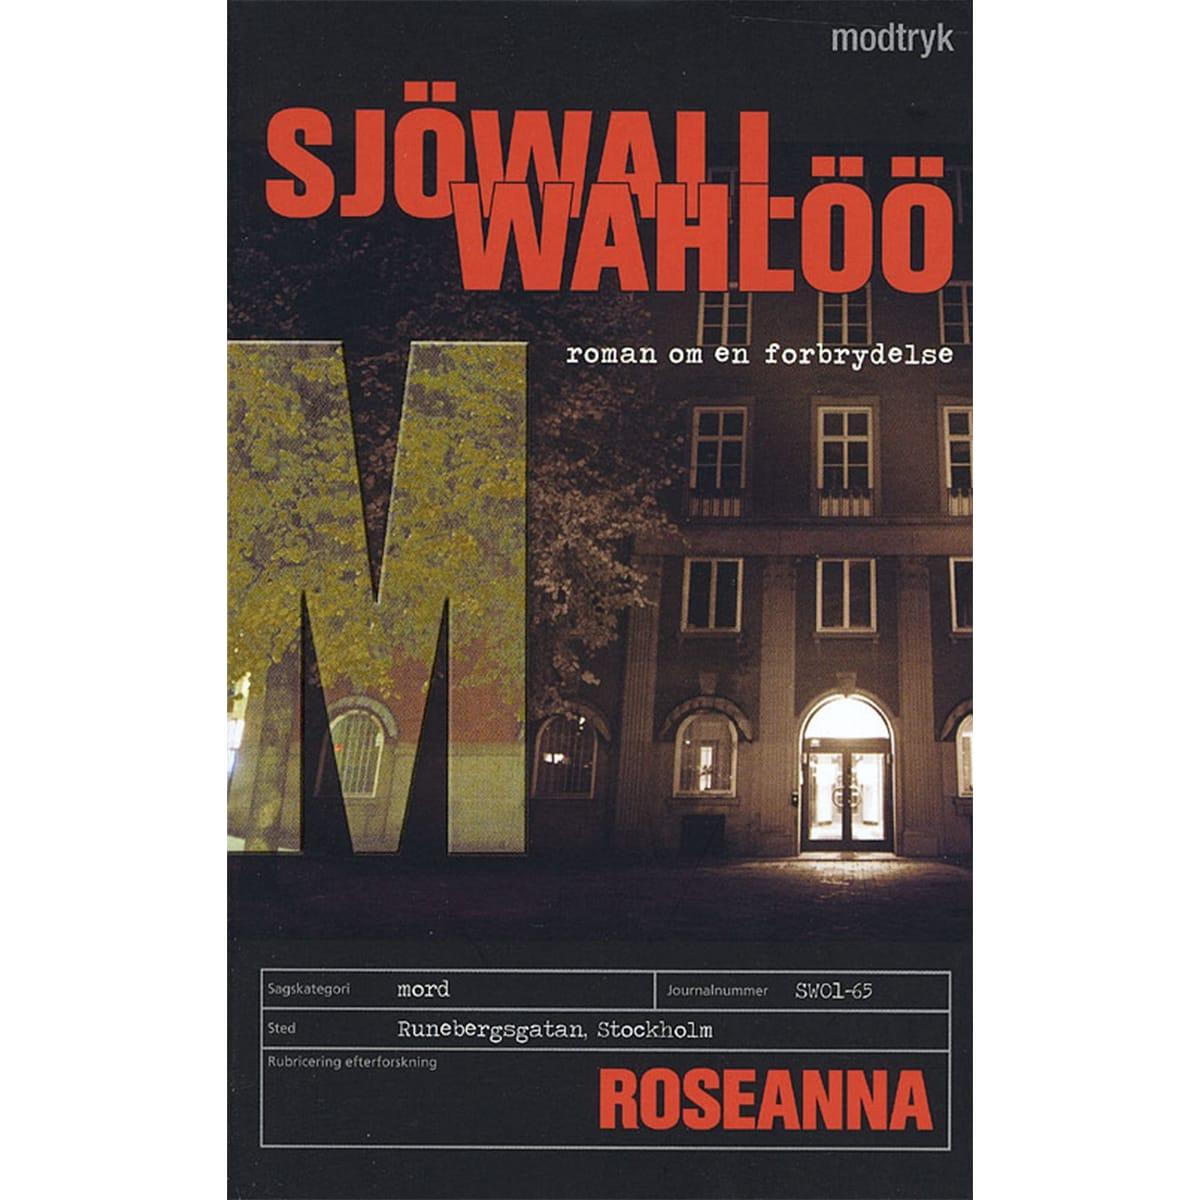 Af Sjöwall & Walhöö